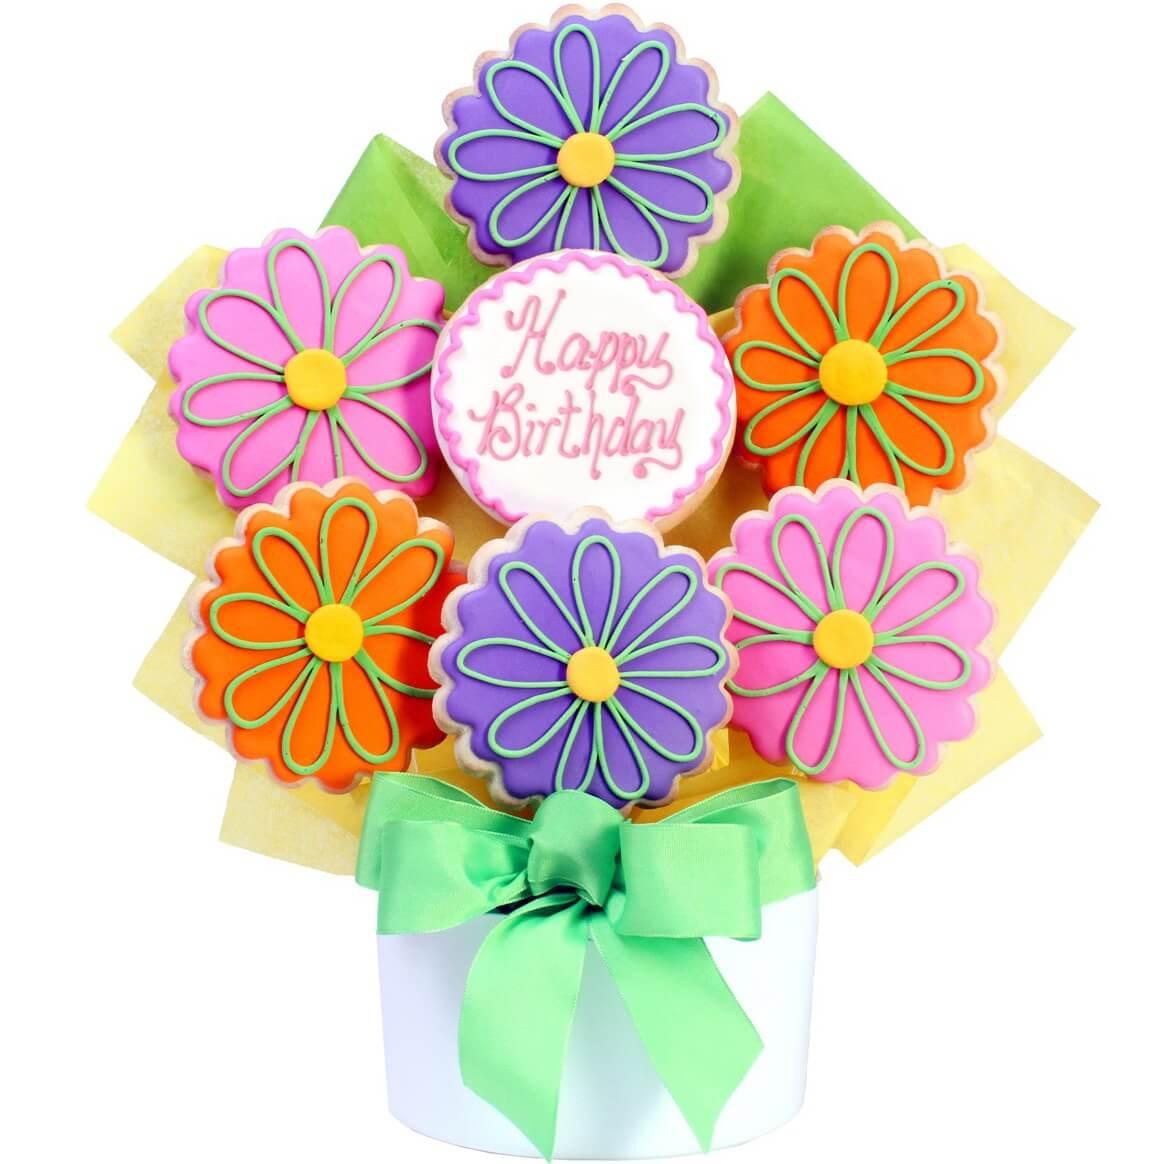 happy birthday flowers cutout